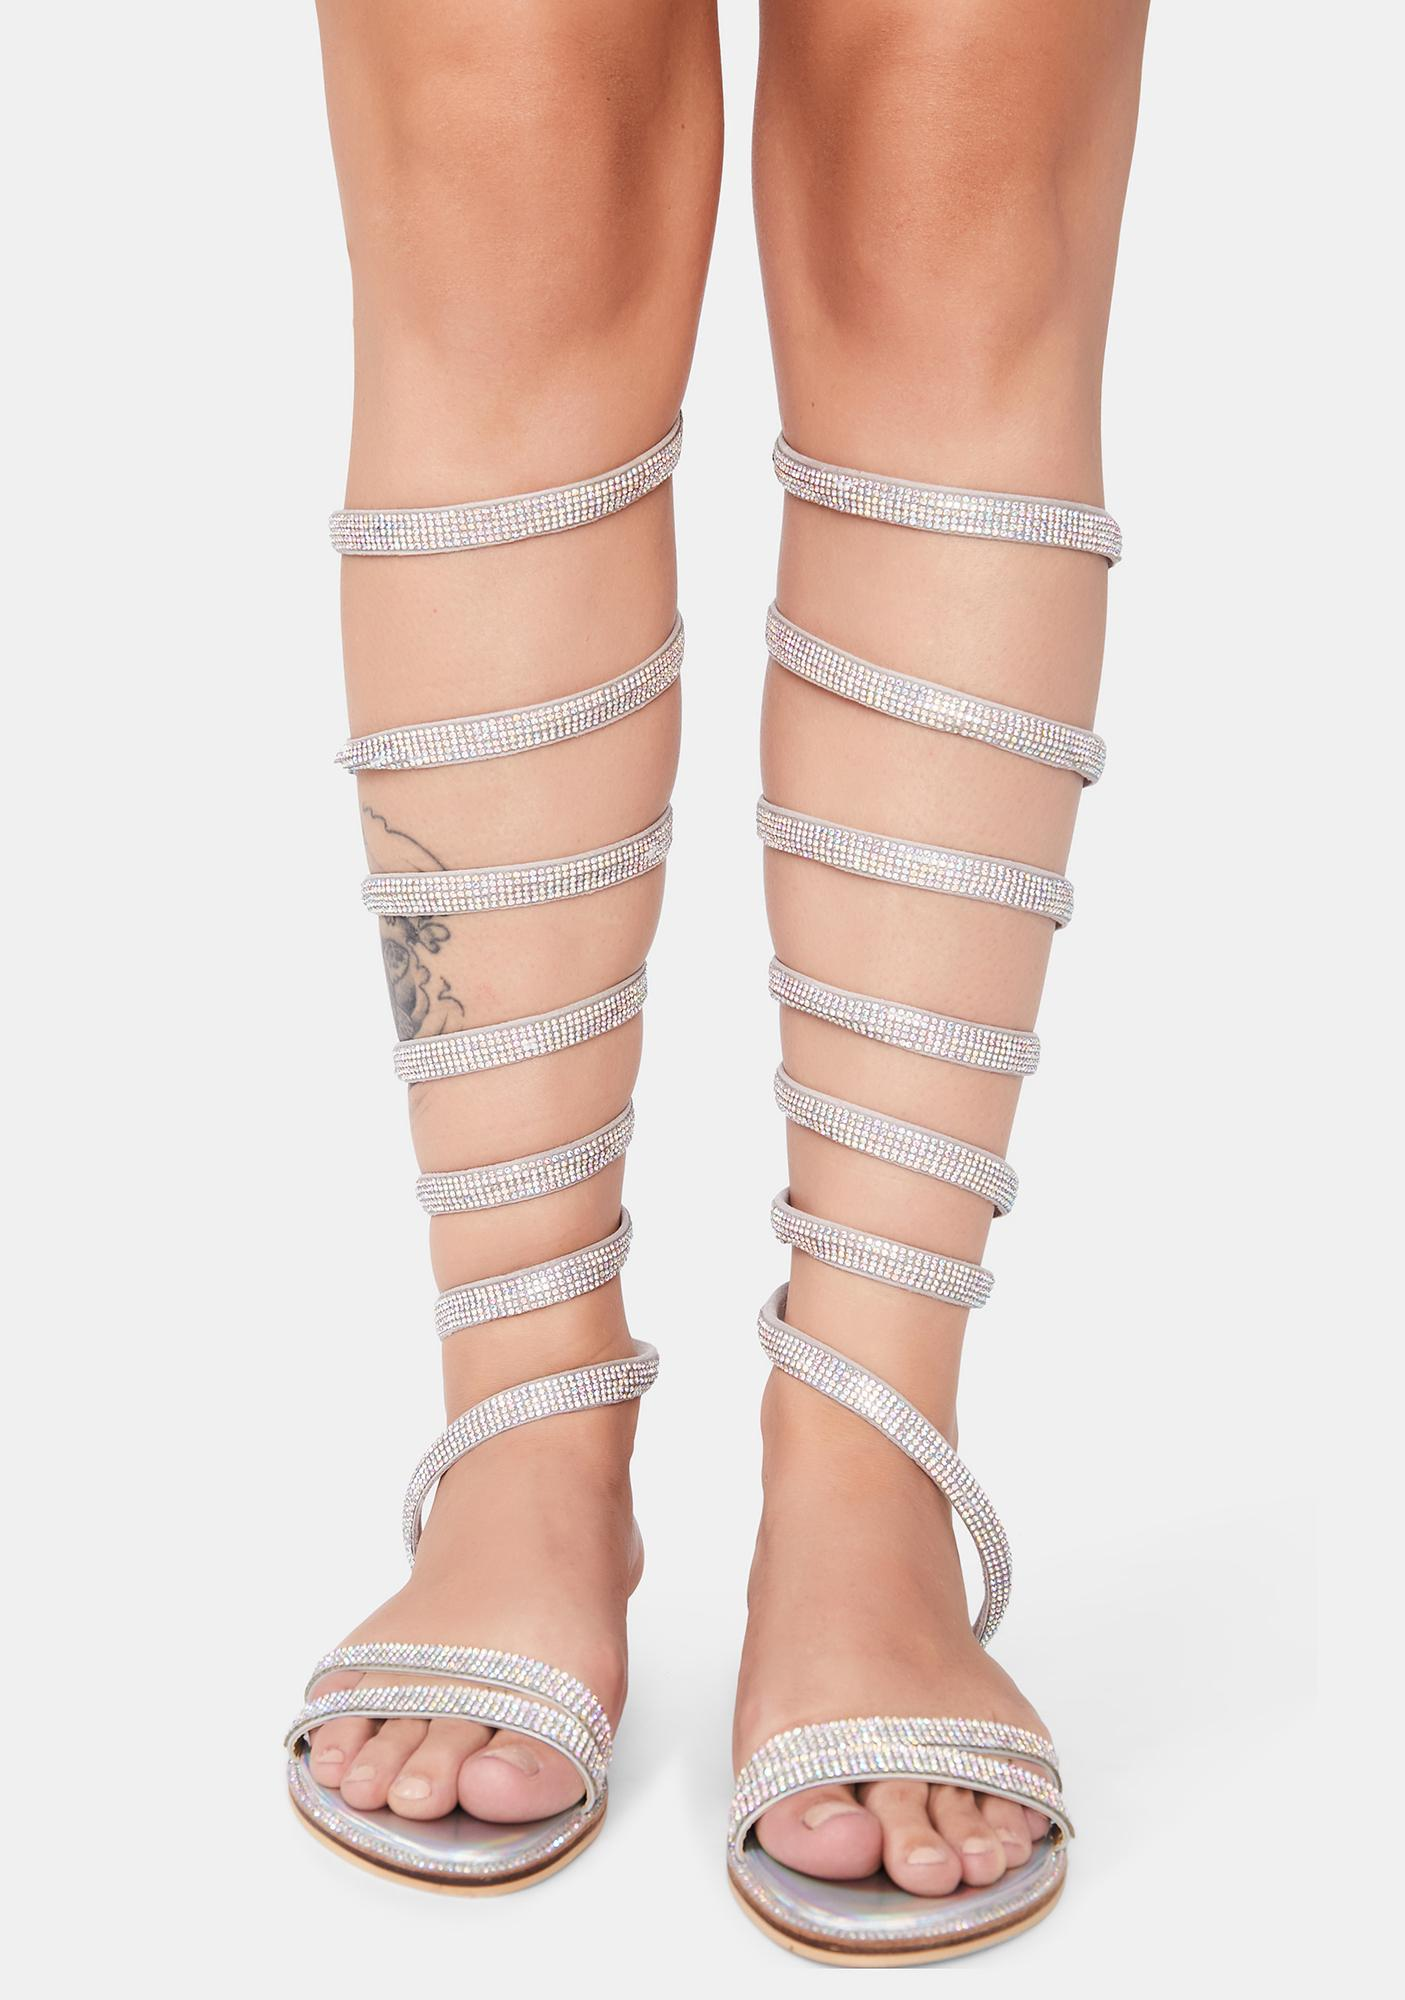 Cosmic Tres Chic Wrap Sandals